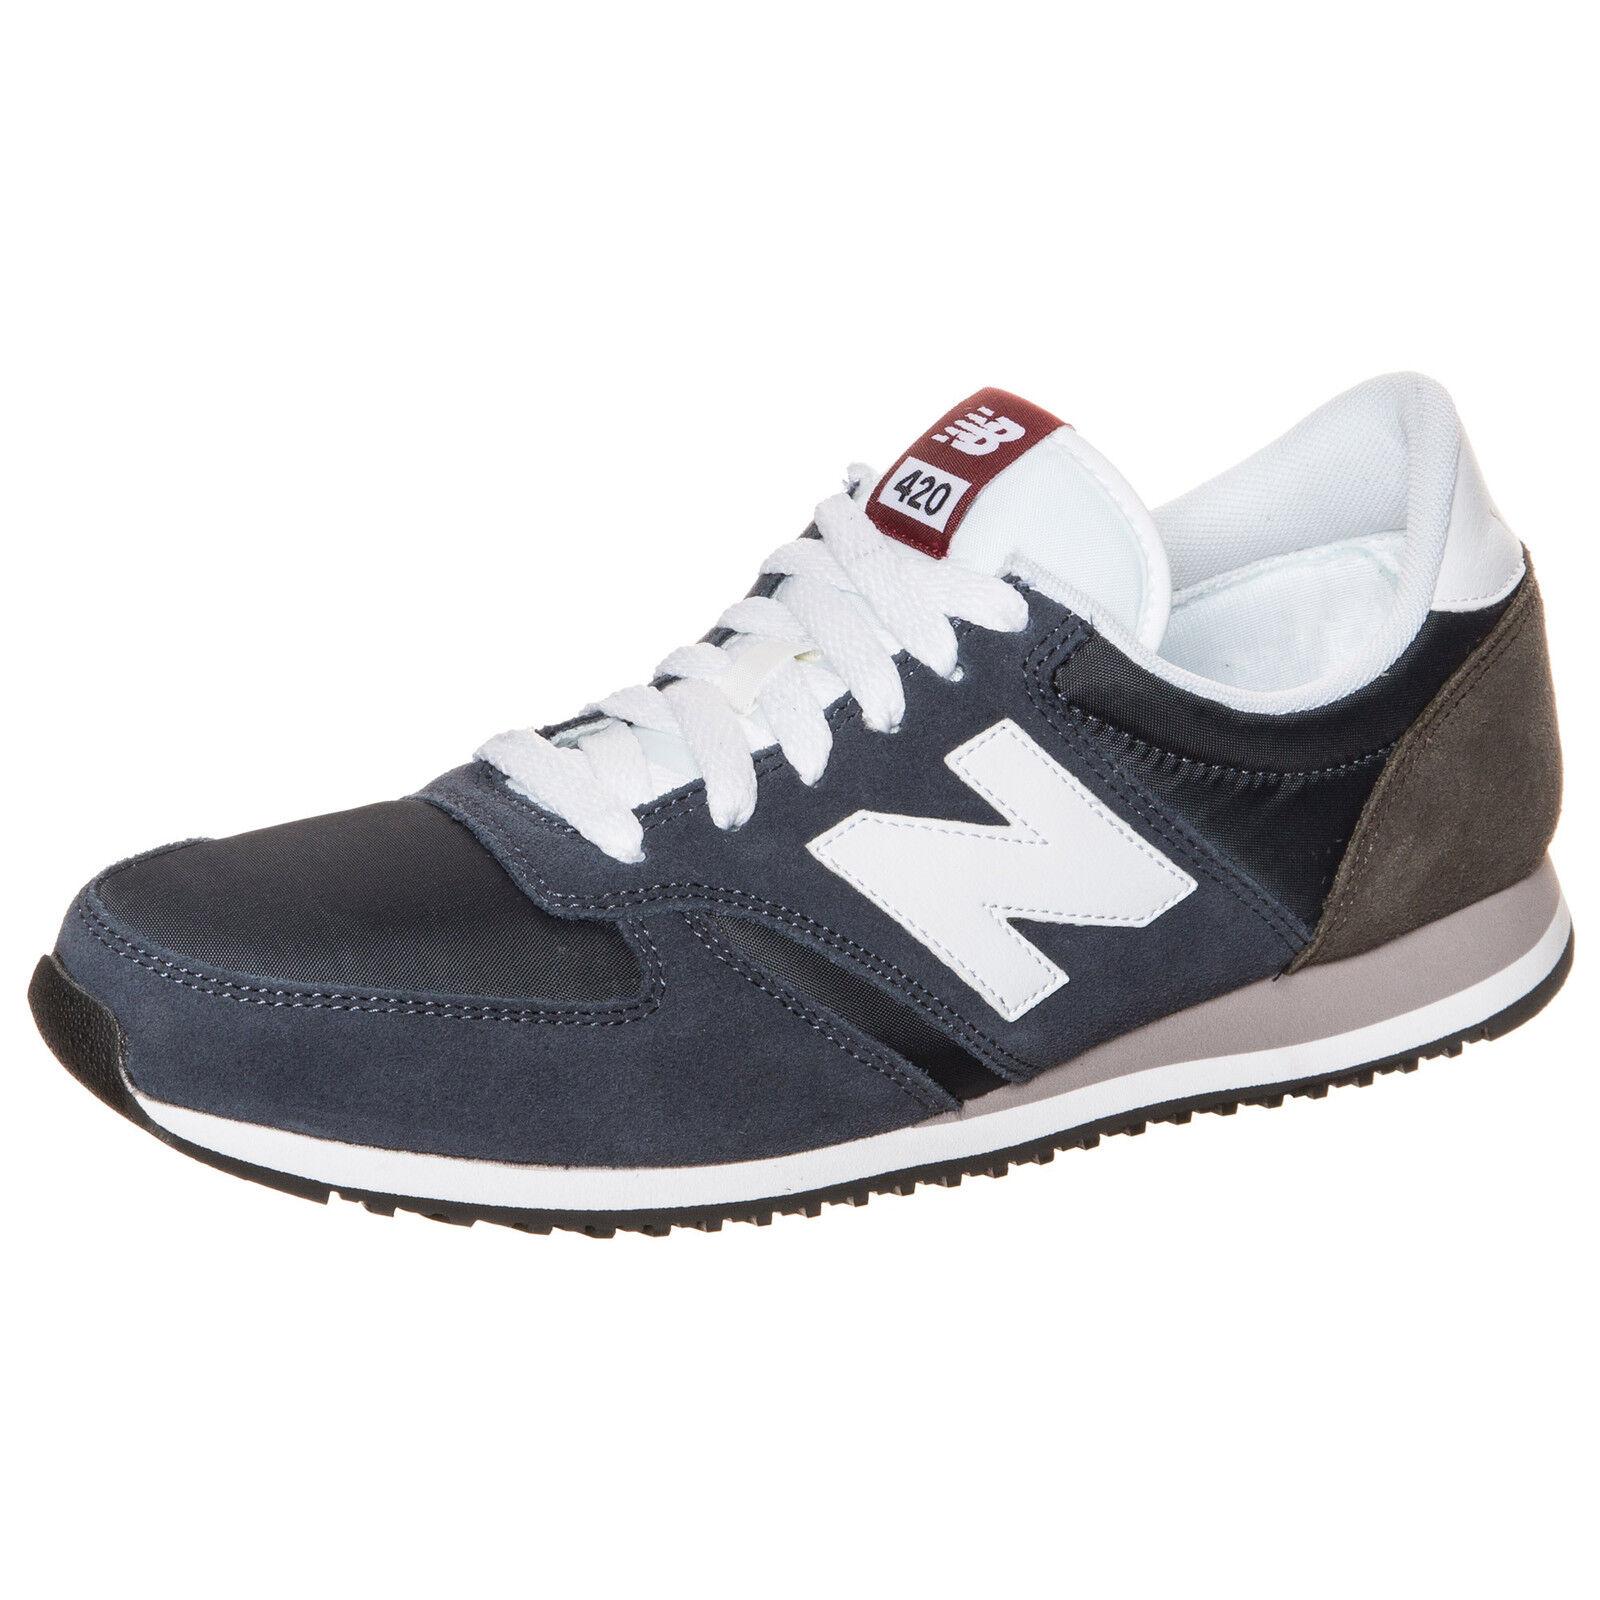 New Balance U420-CNW-D Sneaker Blau NEU Schuhe Turnschuhe